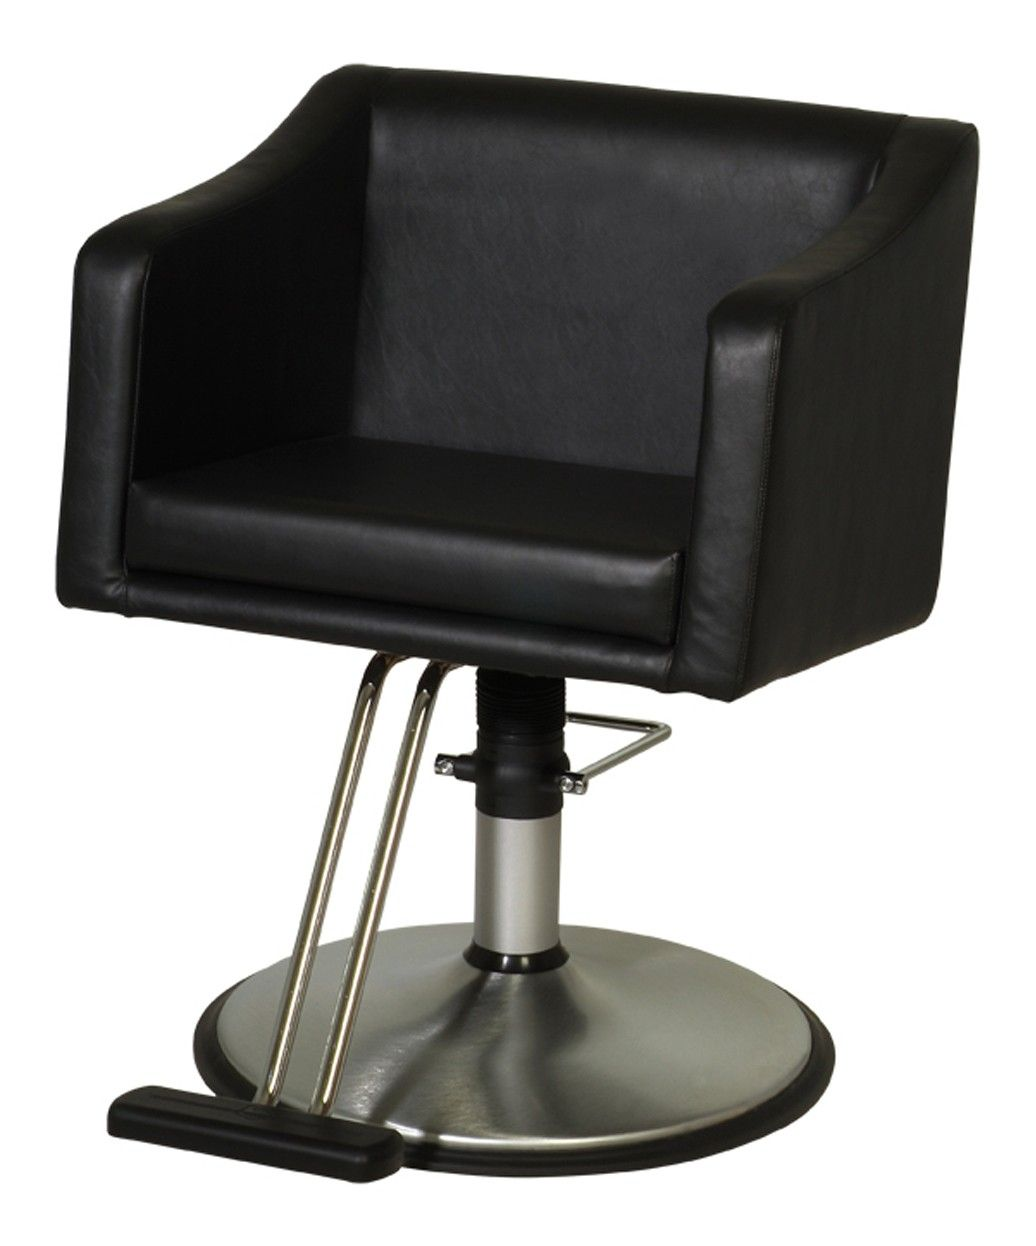 Chair nail salon furniture ak 01 g buy manicure chair nail salon - Find This Pin And More On Salon Styling Chairs By Cindyspratt